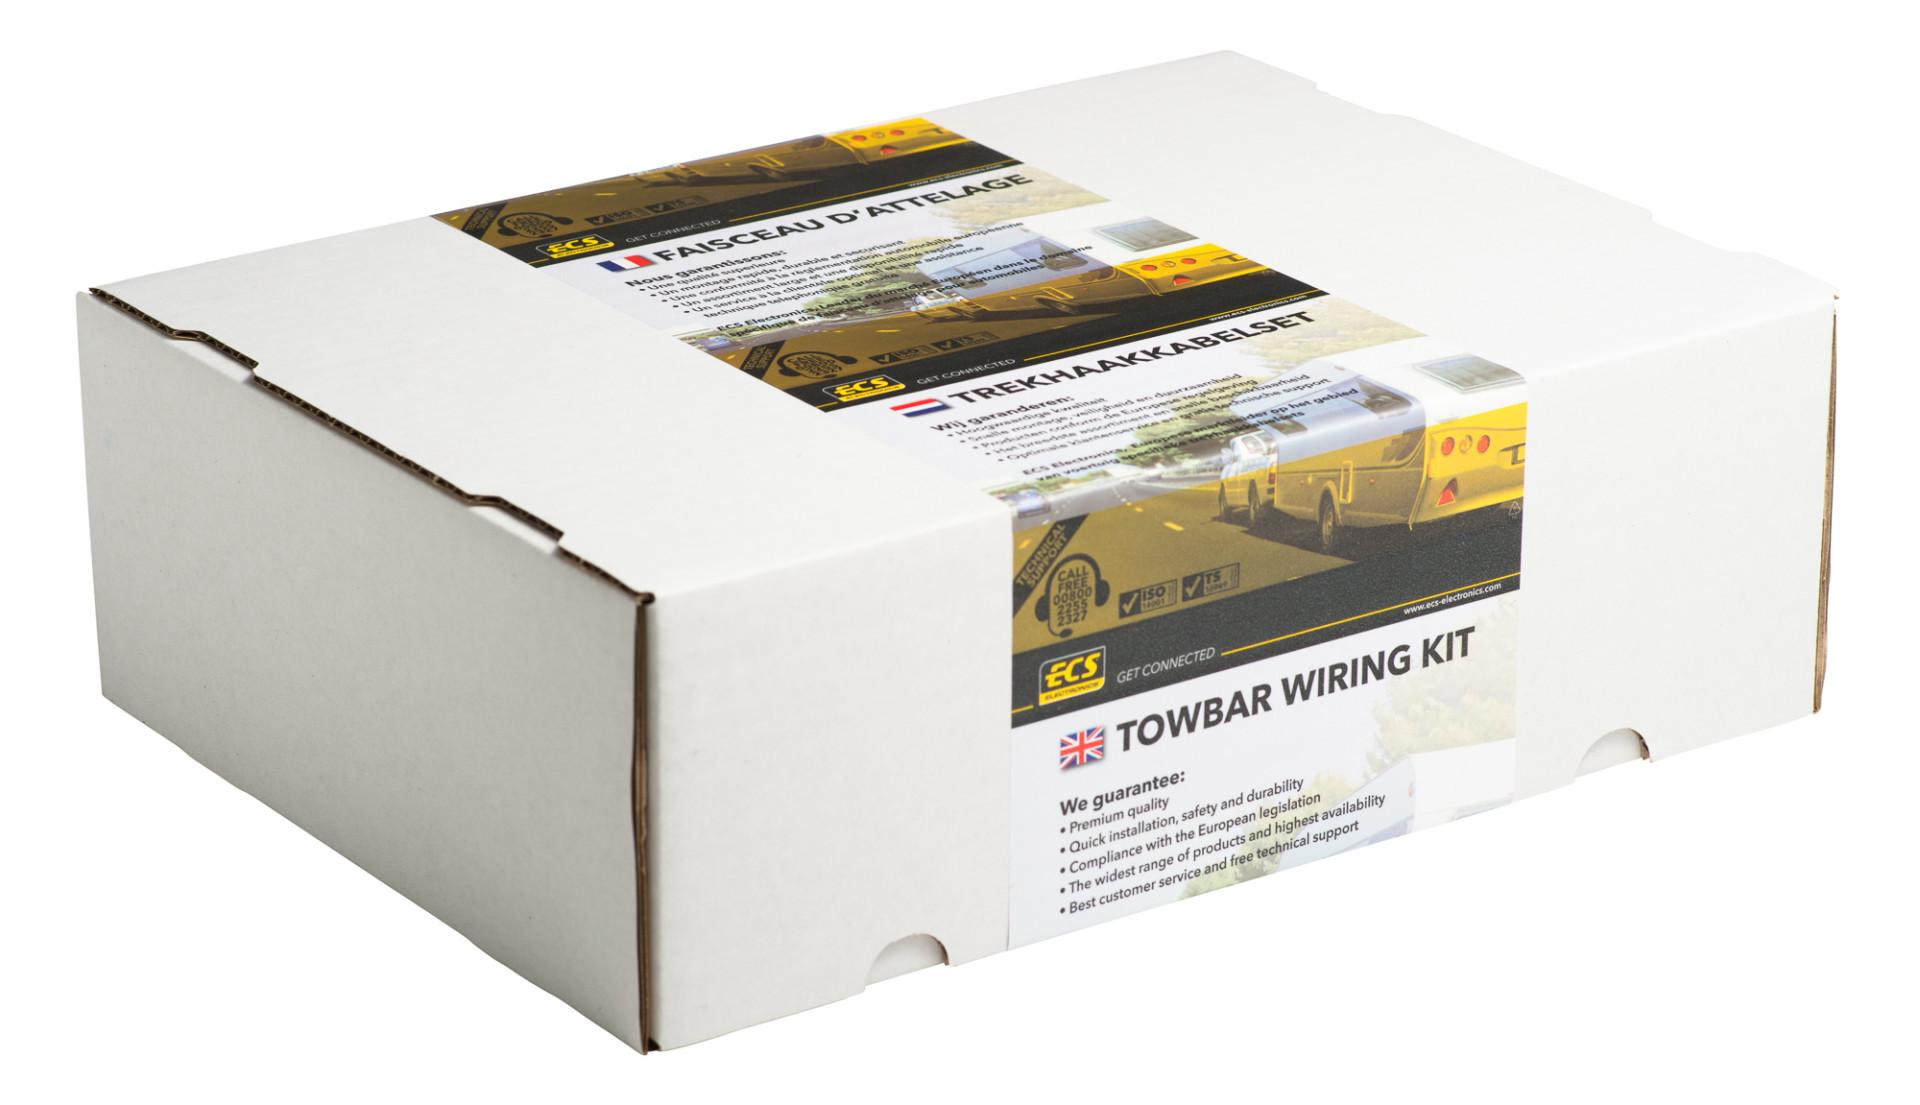 Towbar-wiring-kit-e-commerce-785f3f